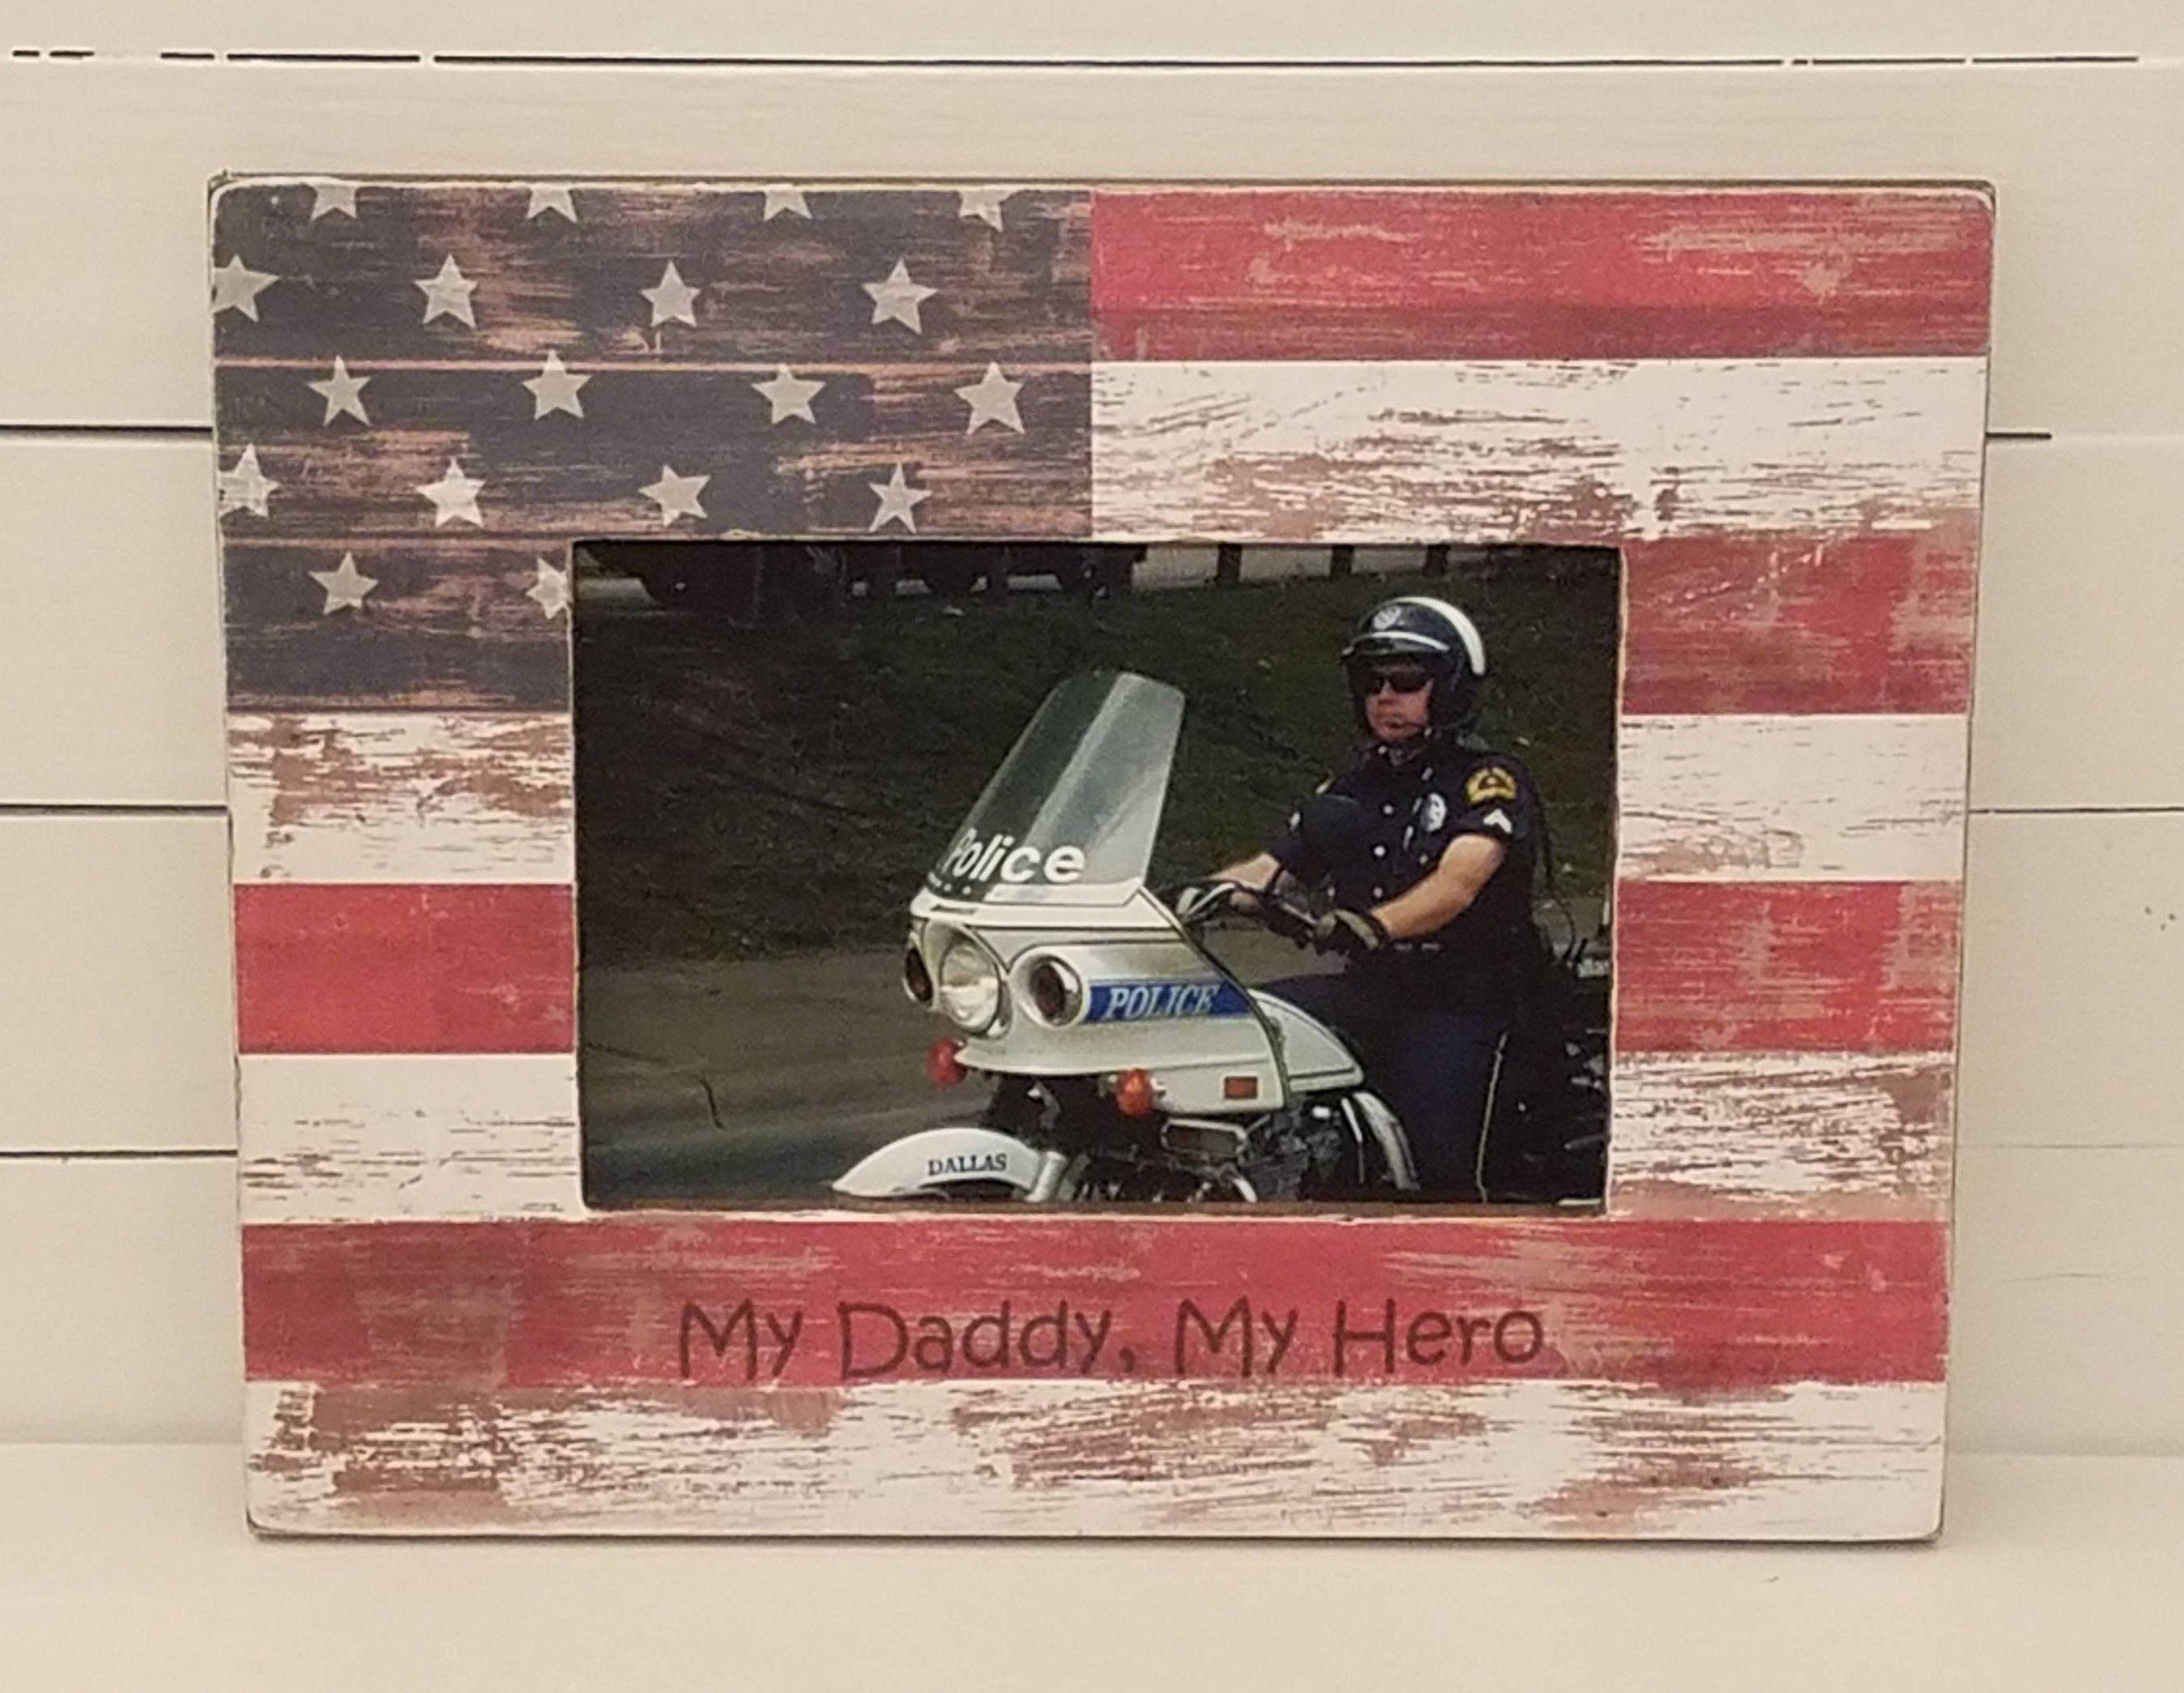 Personalized patriotic gifts #patriotic #militarygifts #policegifts #usveterans #christmasgiftideas #ustroops #usmarines #thankavet #armedforces # ...